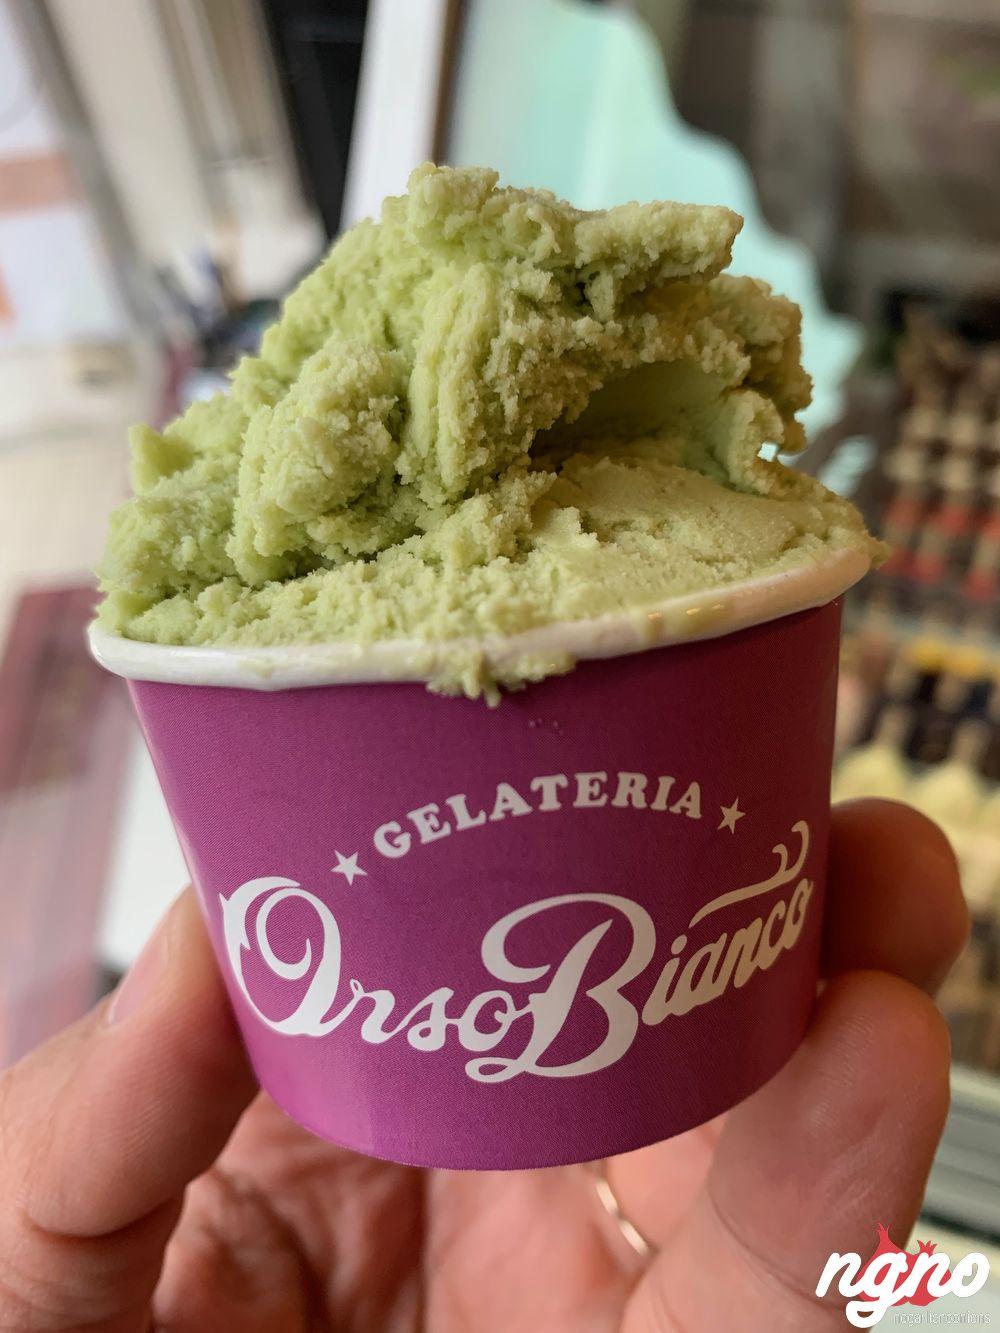 orsobianco-gelateria-ice-cream-achrafieh-nogarlicnoonions-192019-02-24-10-25-50